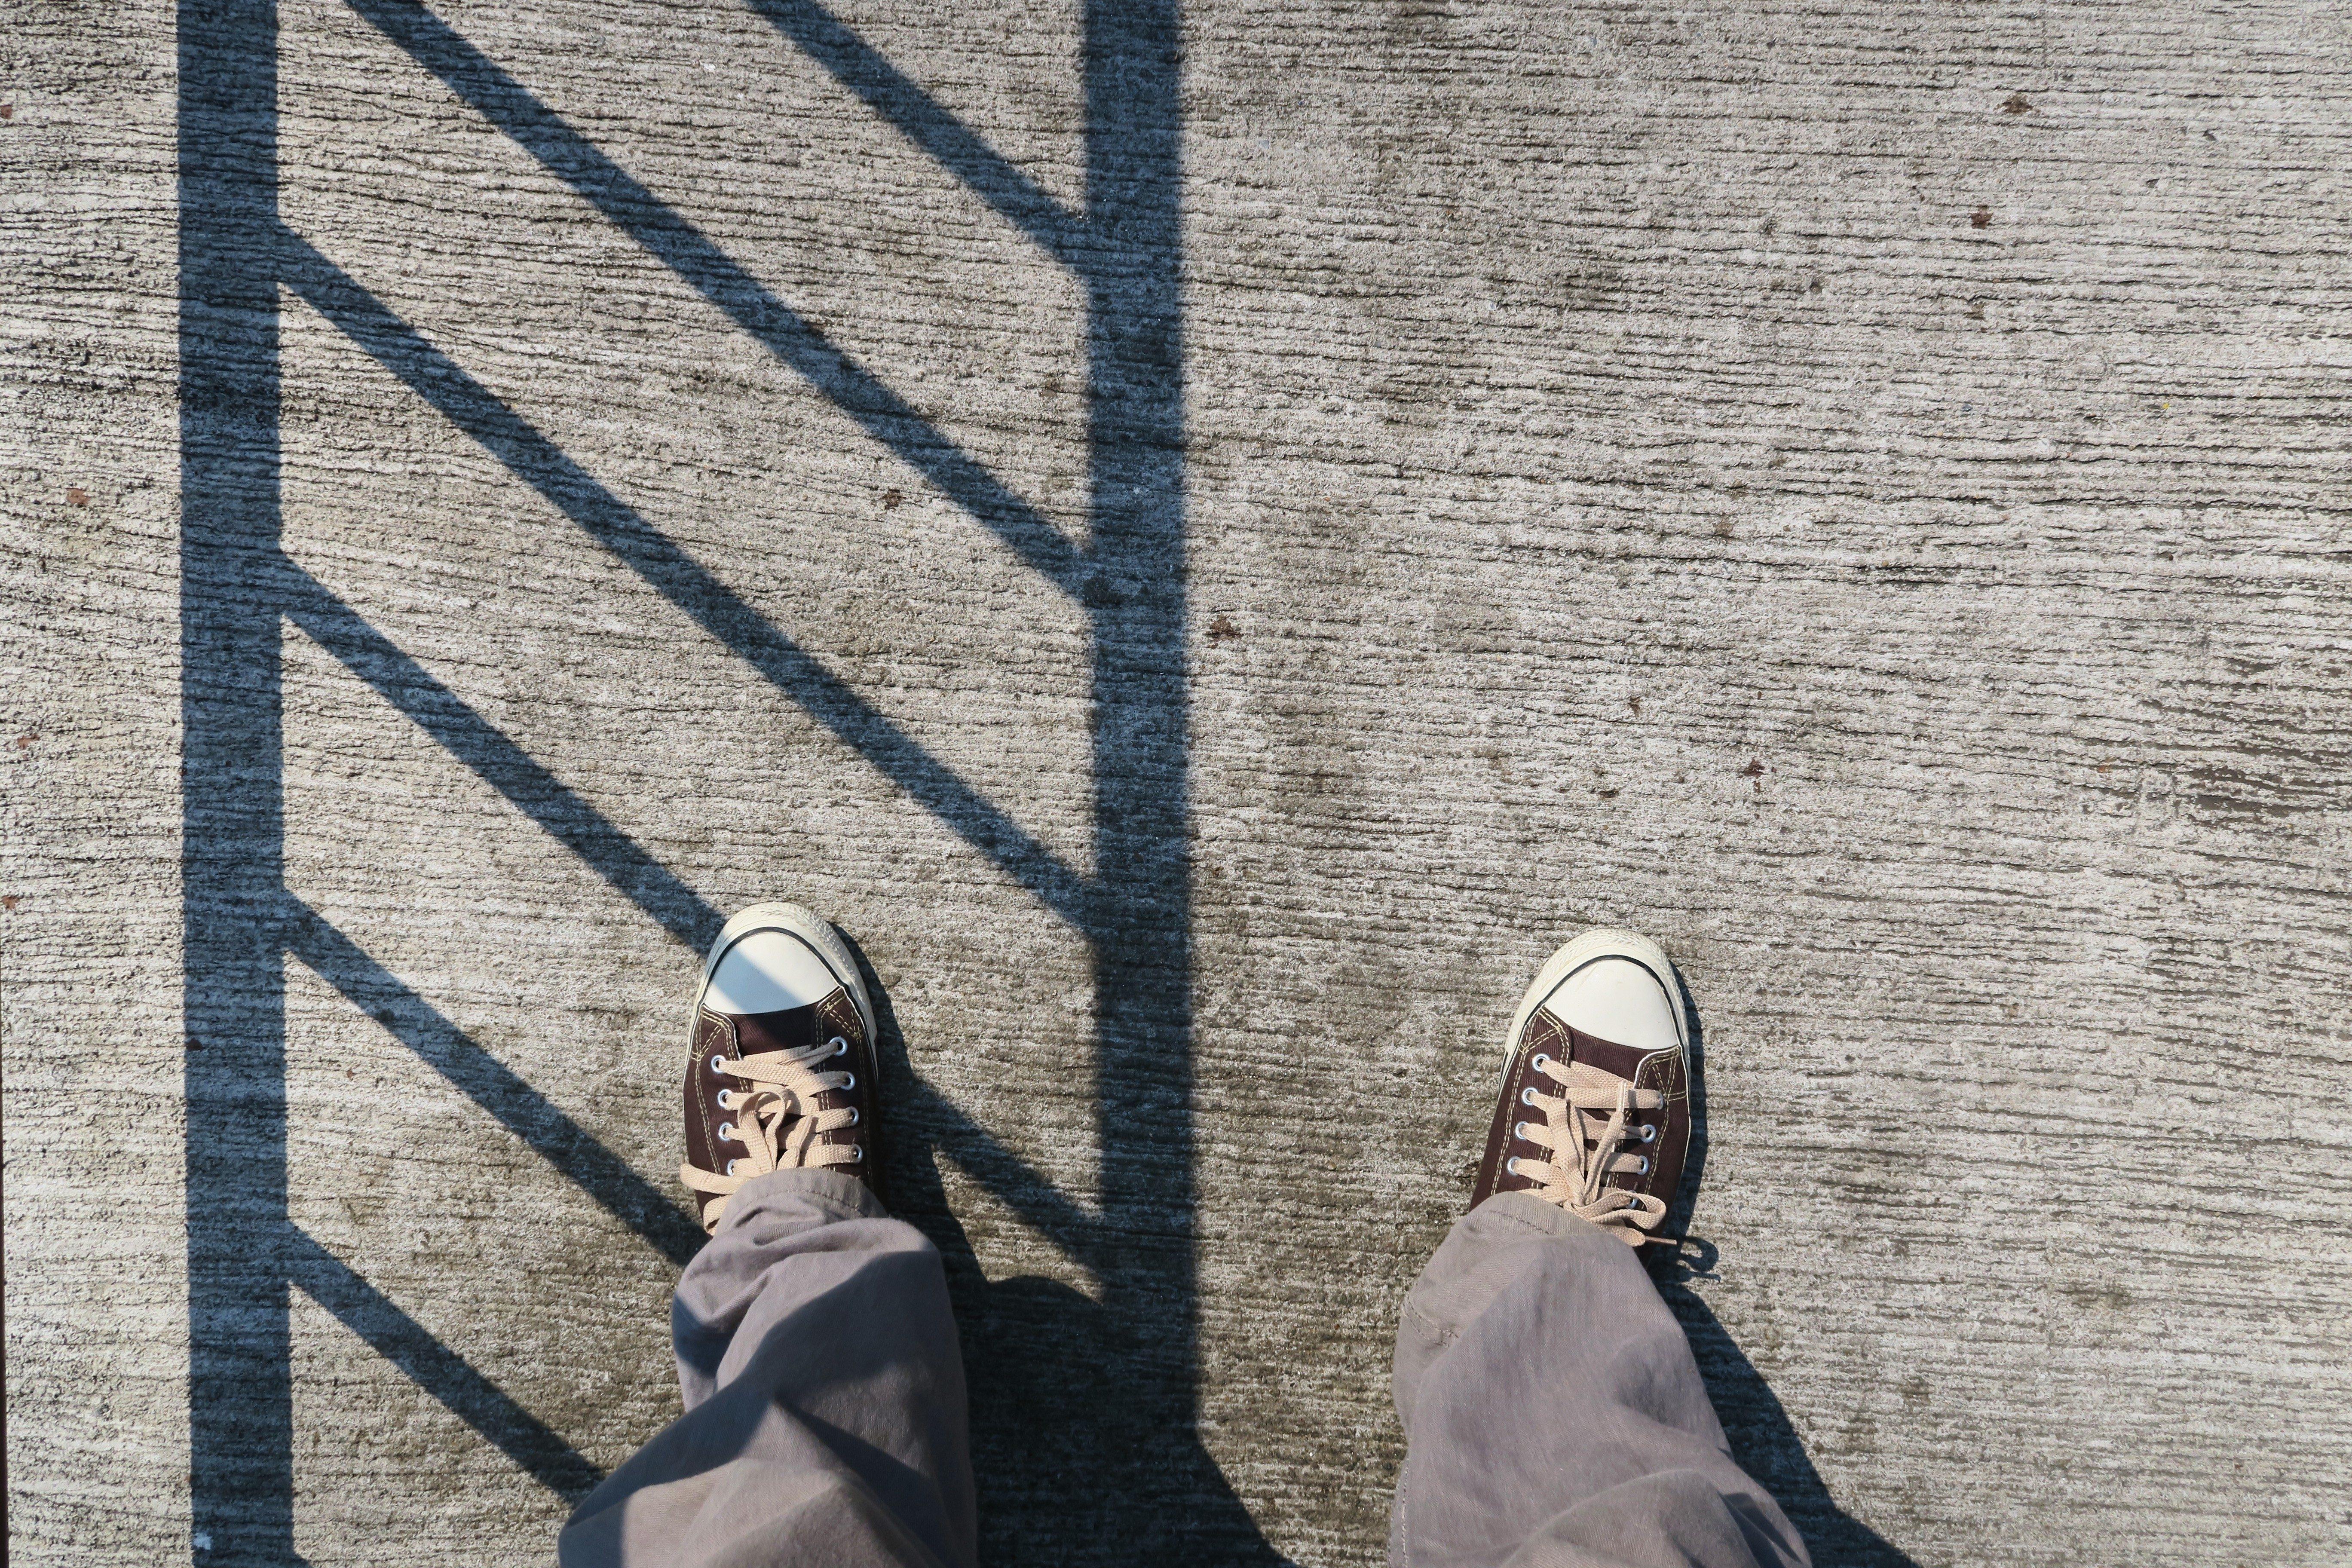 Looking down on feet